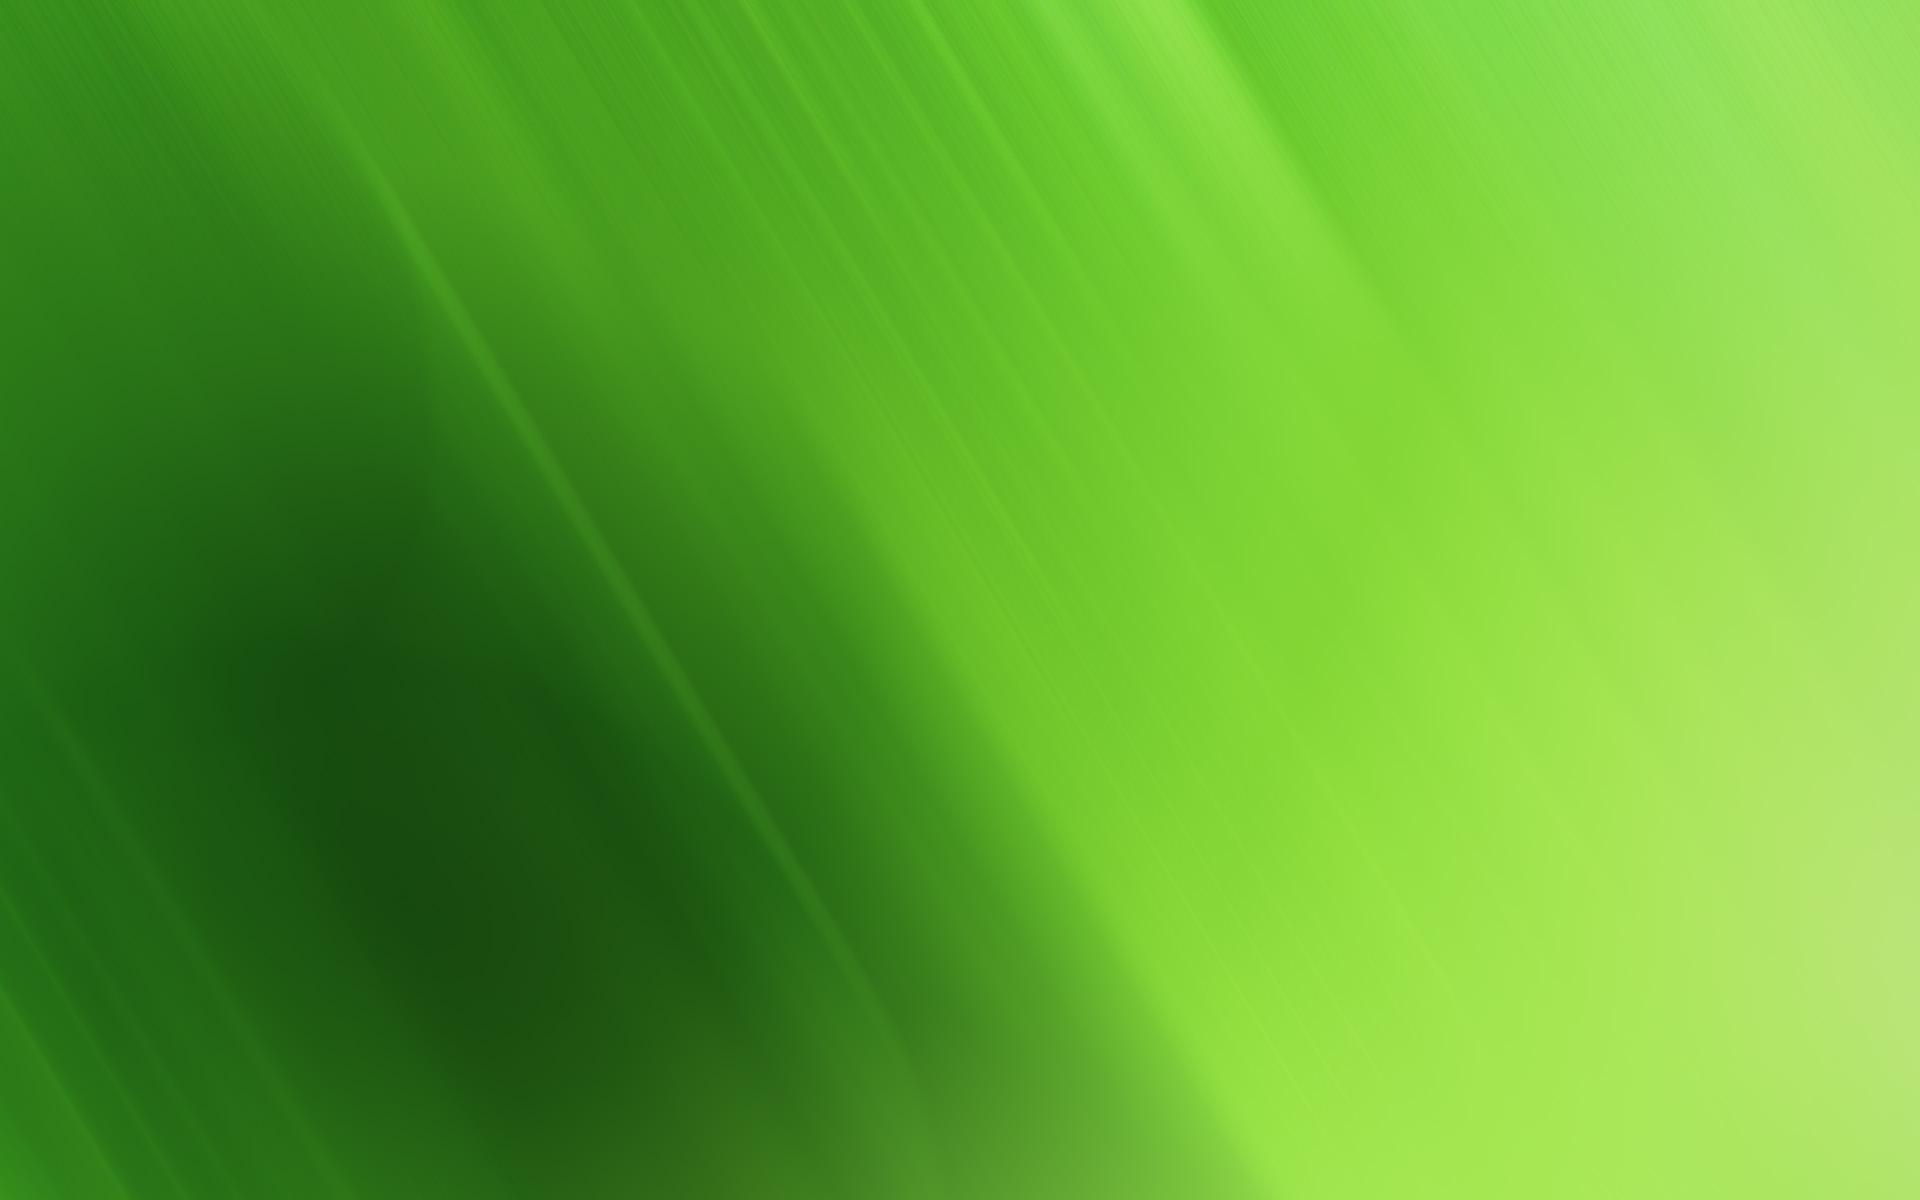 wallpapers abstract green desktop background 1920x1200 1920x1200